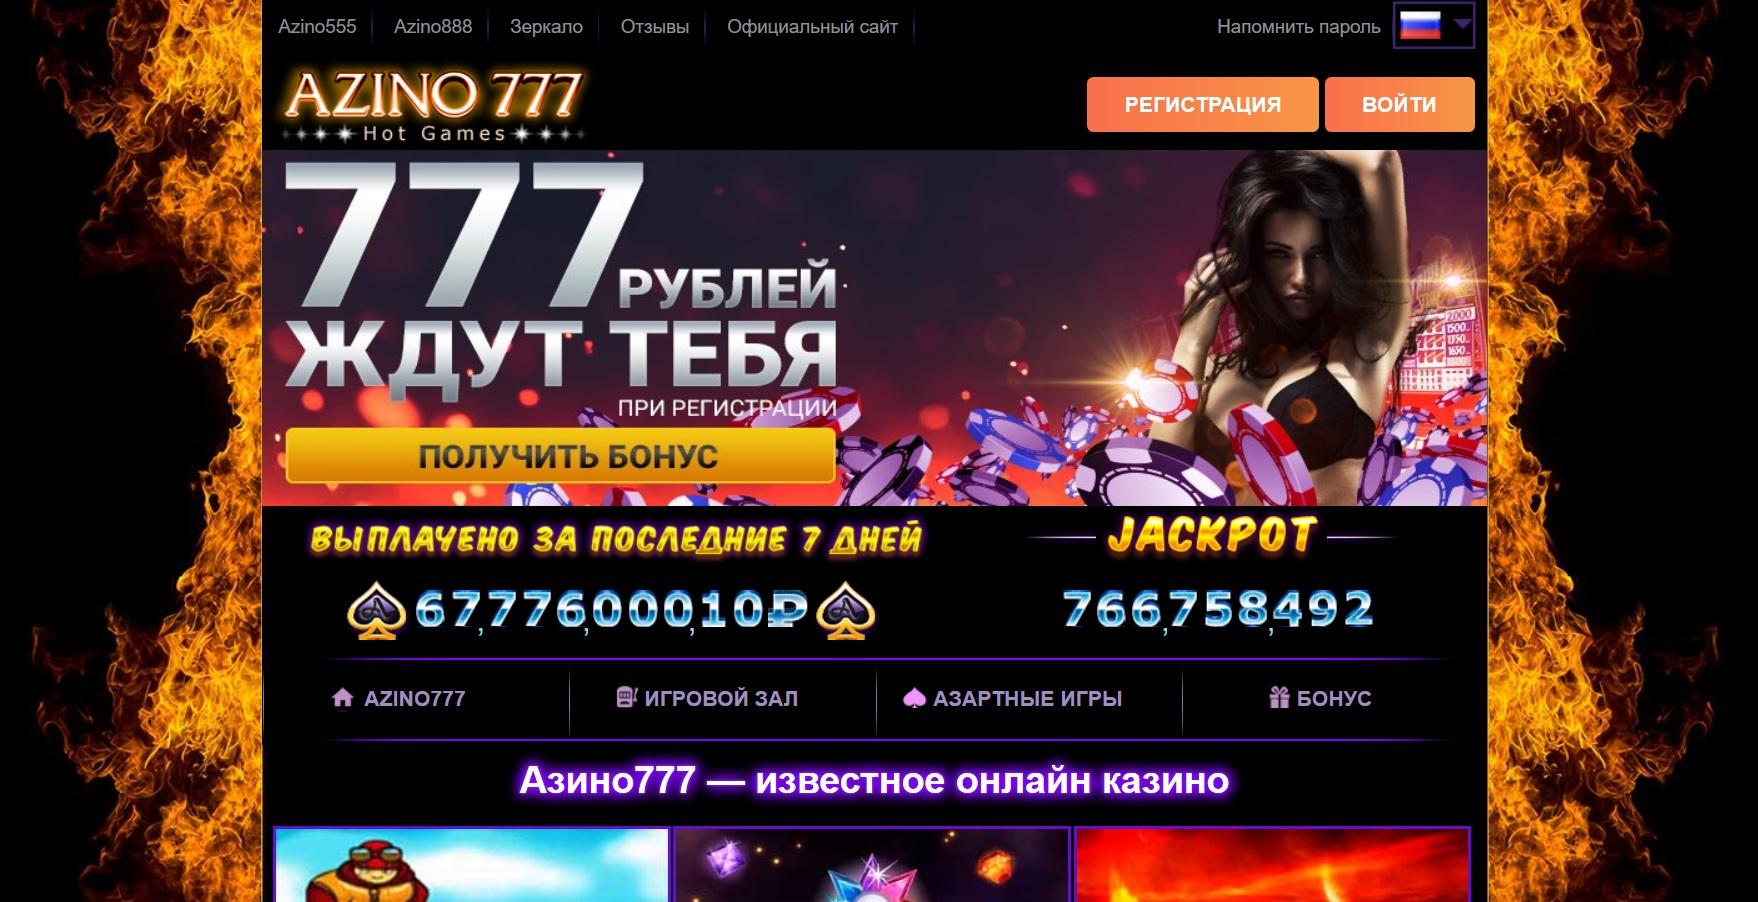 azino888 12